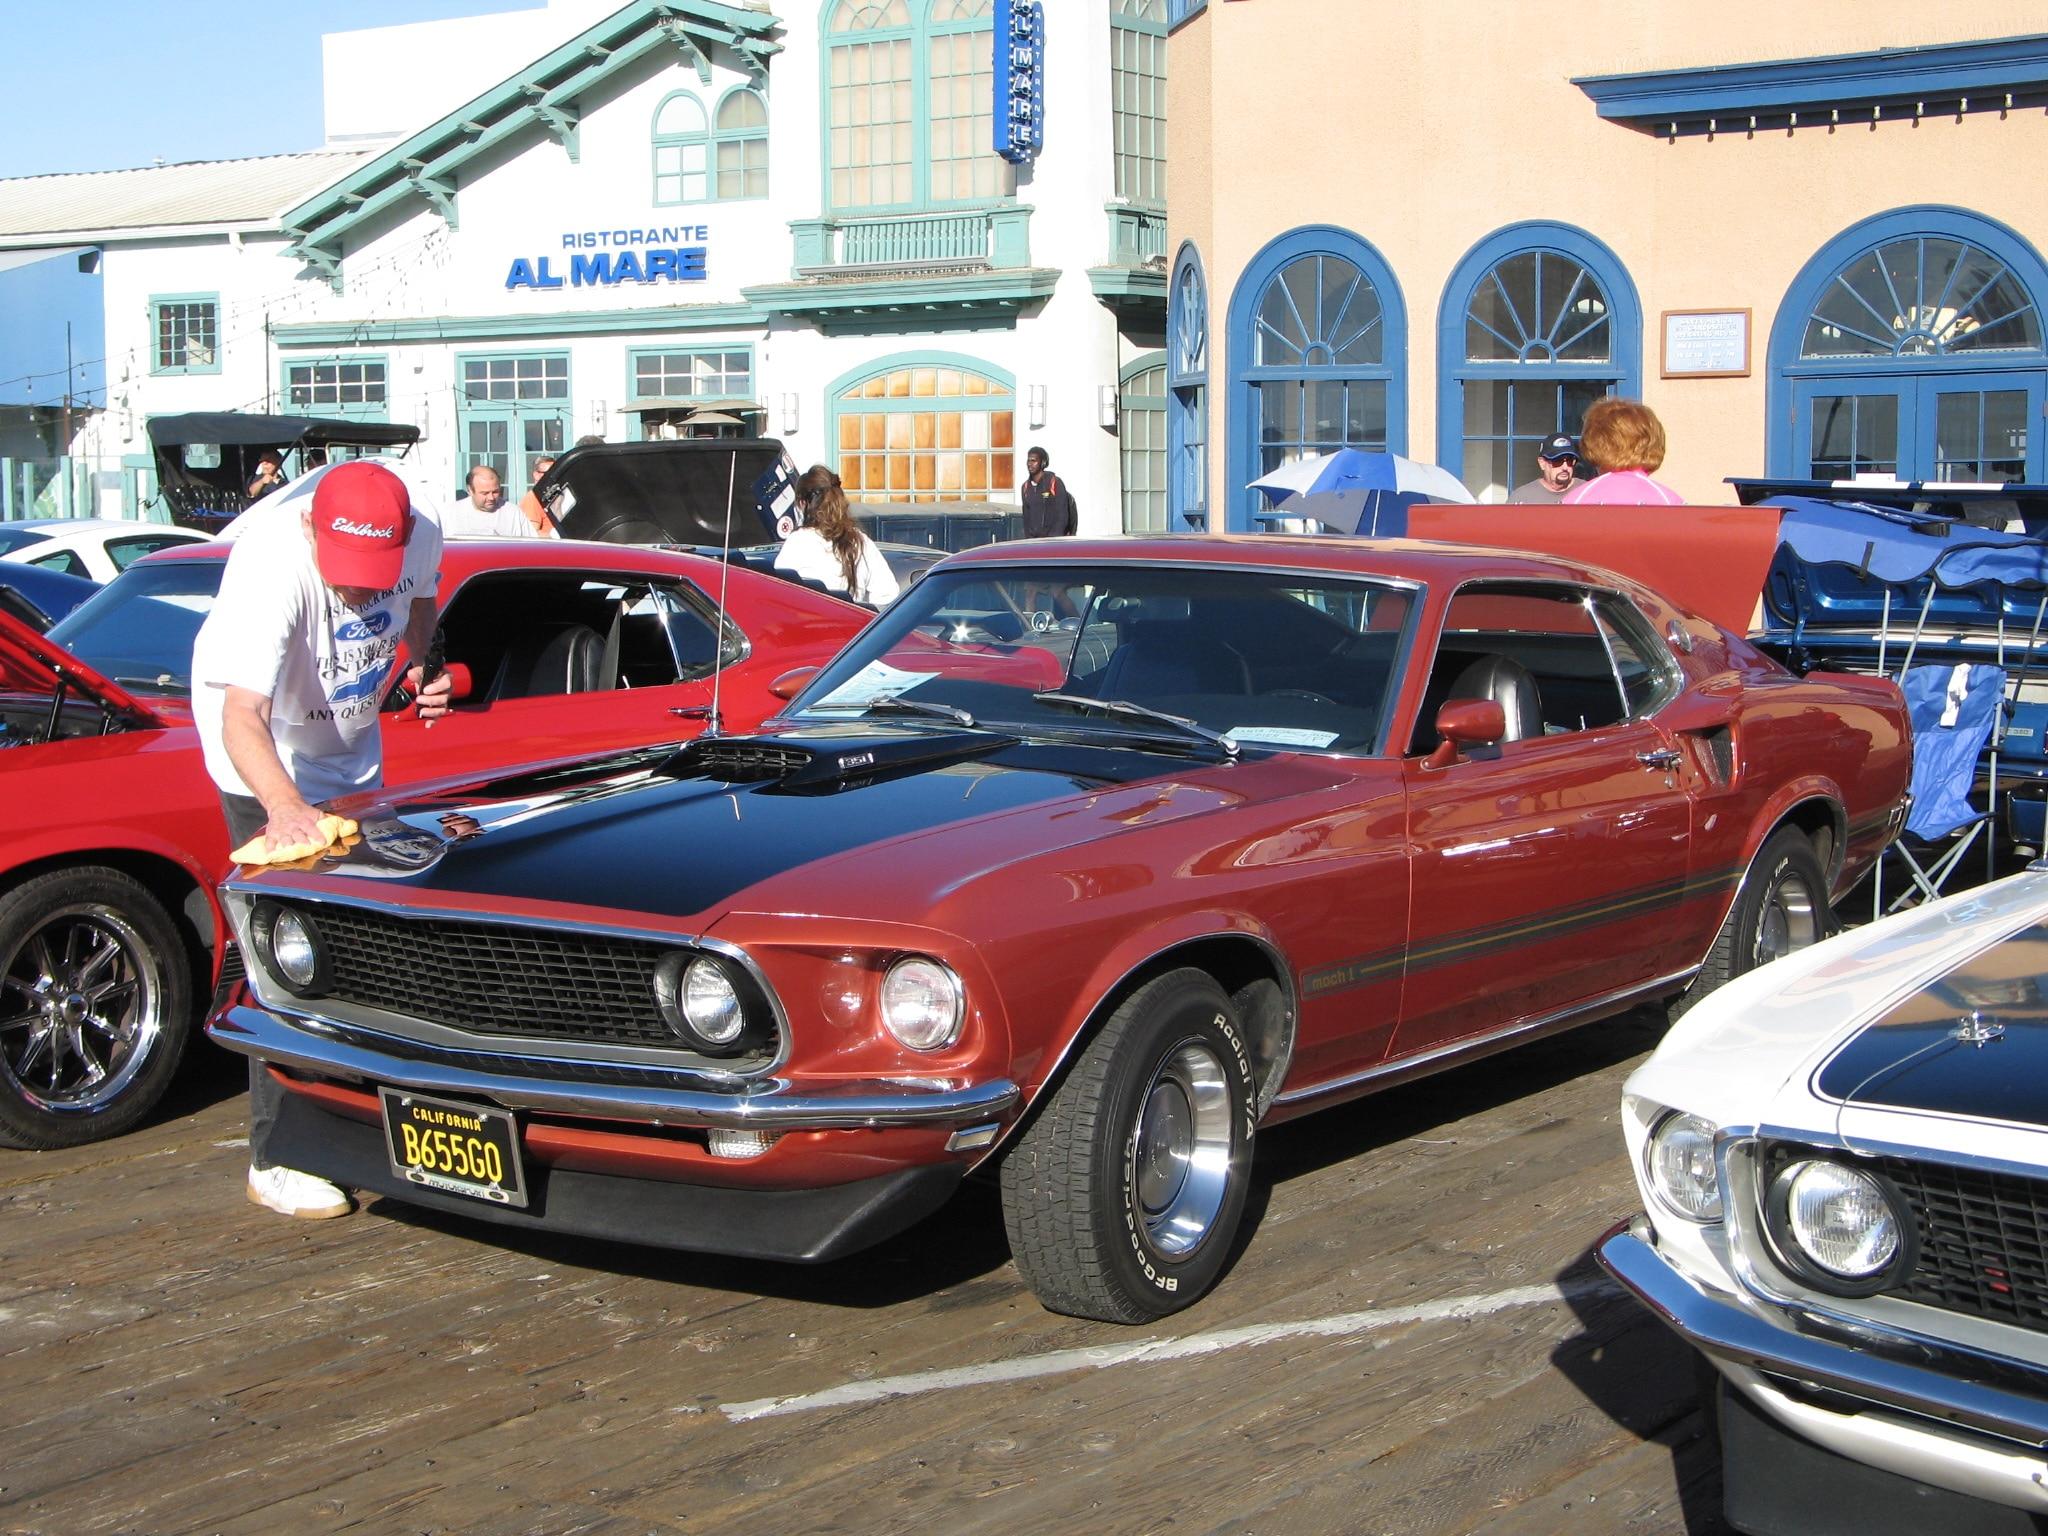 2016 Shelbys On Santa Monica Pier Lasaac 02